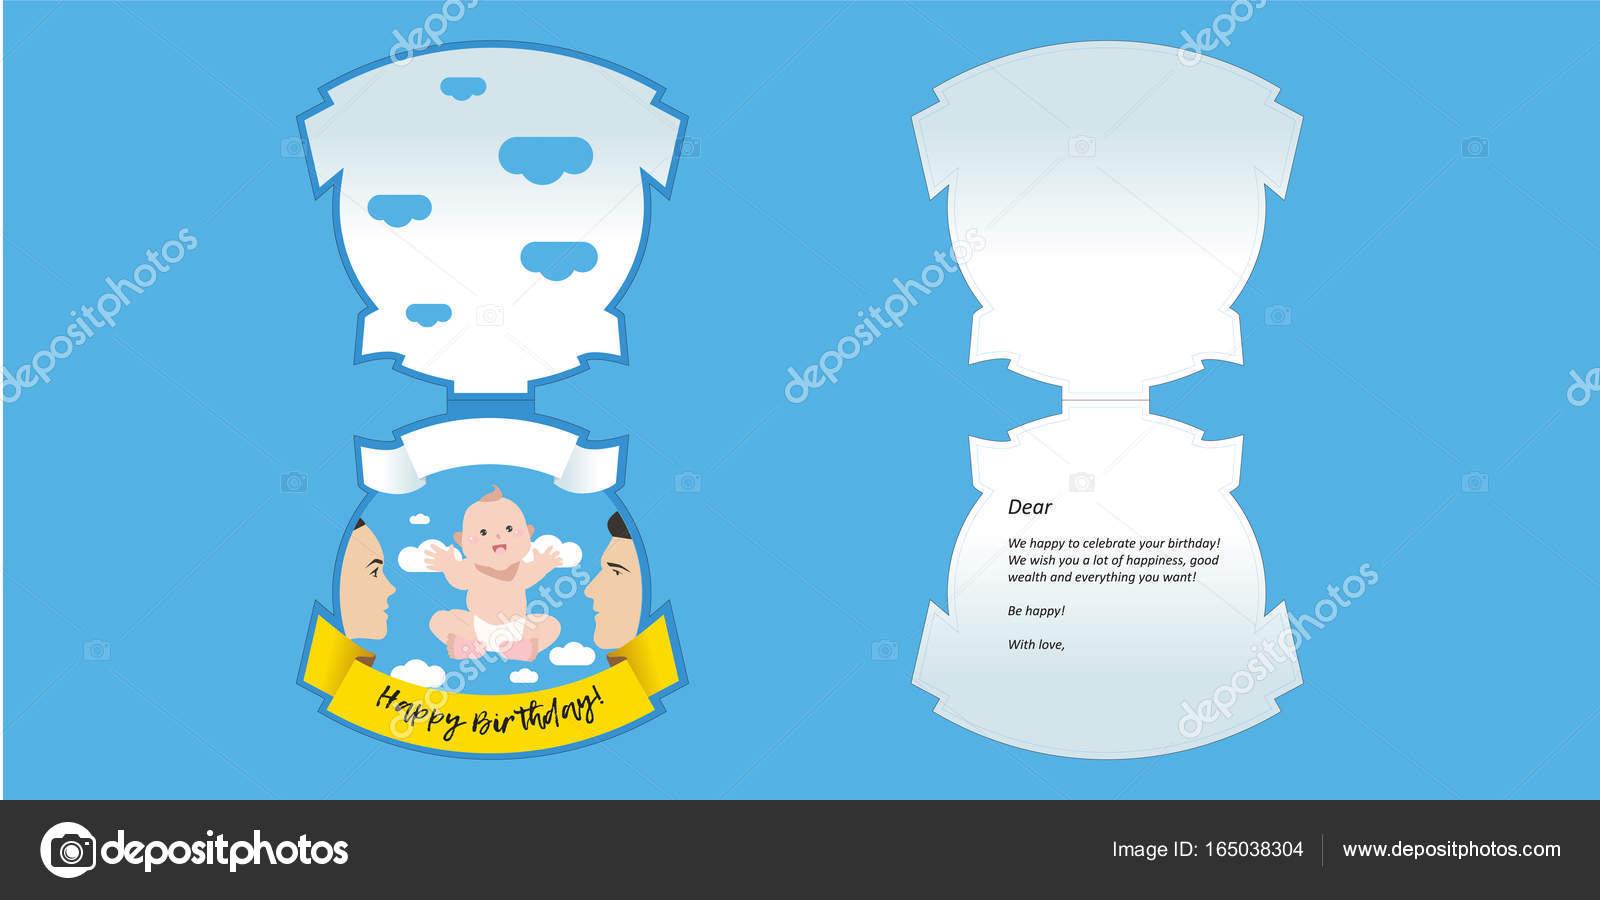 Happy Birthday Baby Shower Greeting Card Image Vectorielle Manjuna